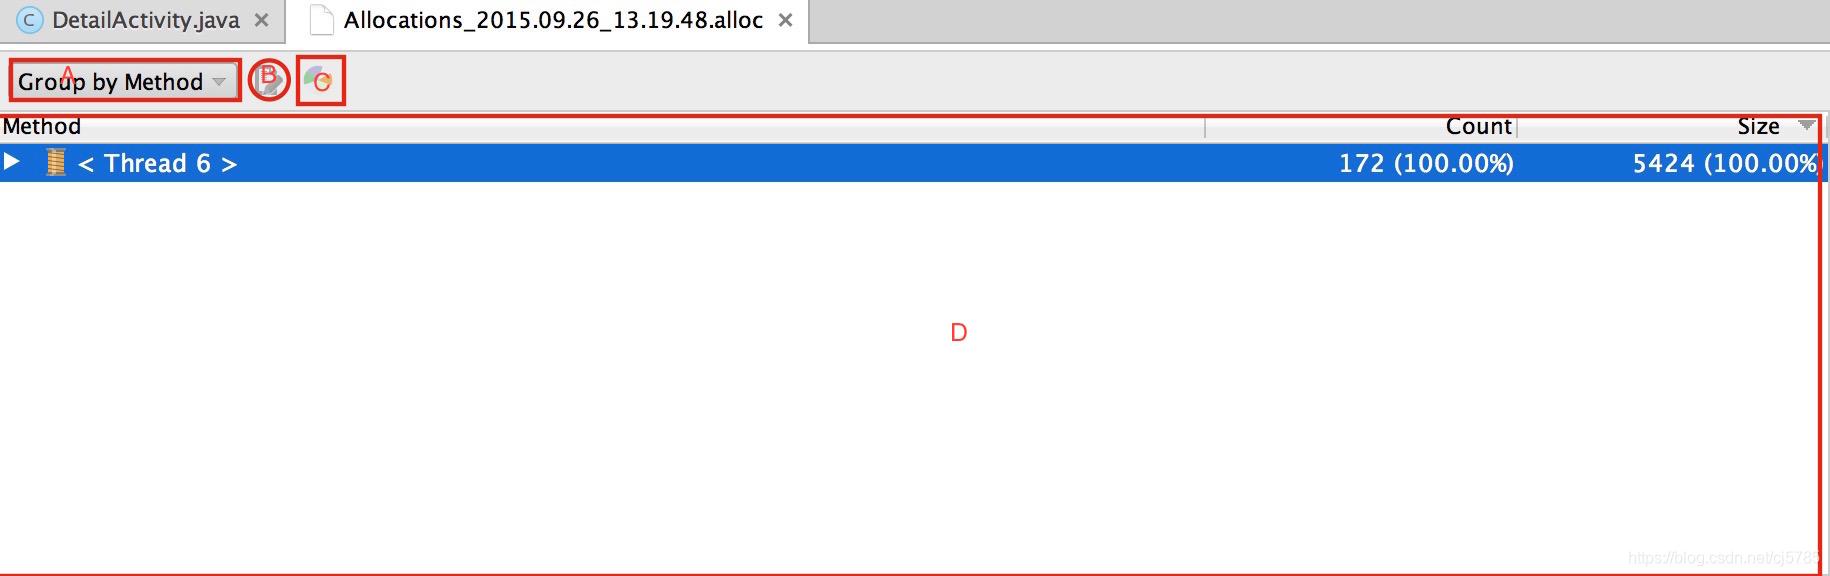 Allocation Tracker详细介绍信息面板